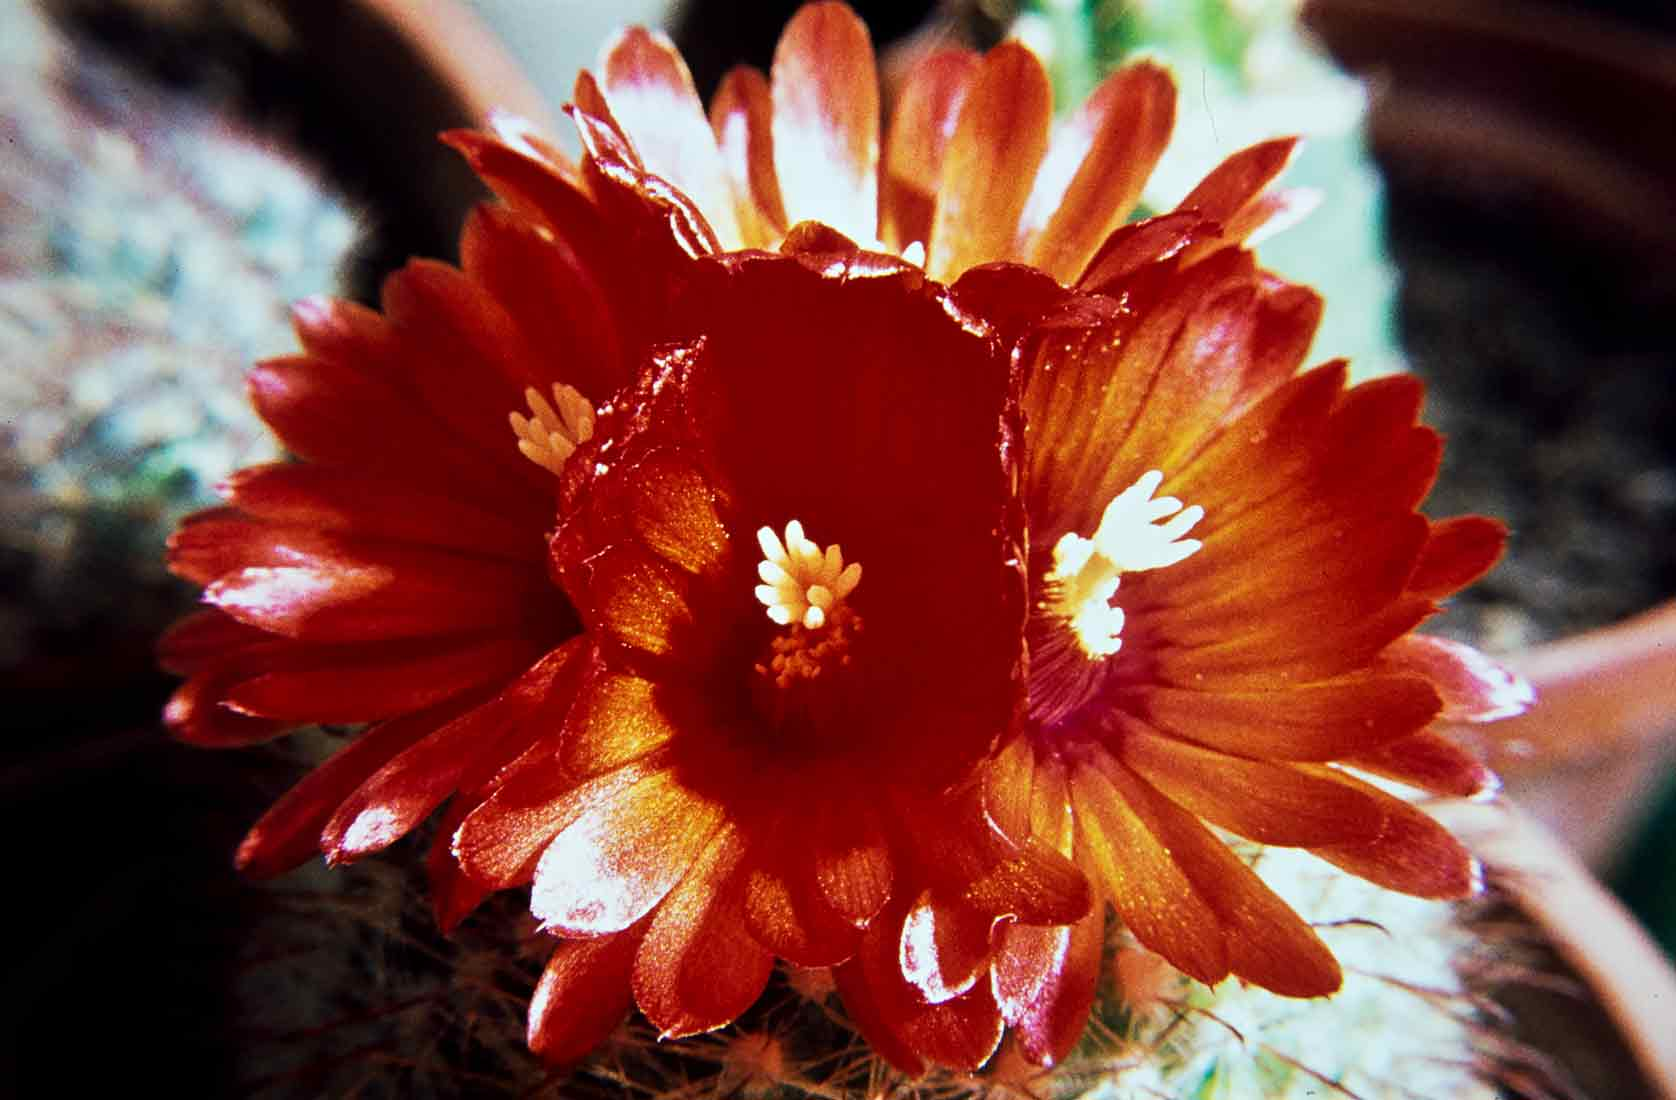 Parodia-sangniniflora-1975